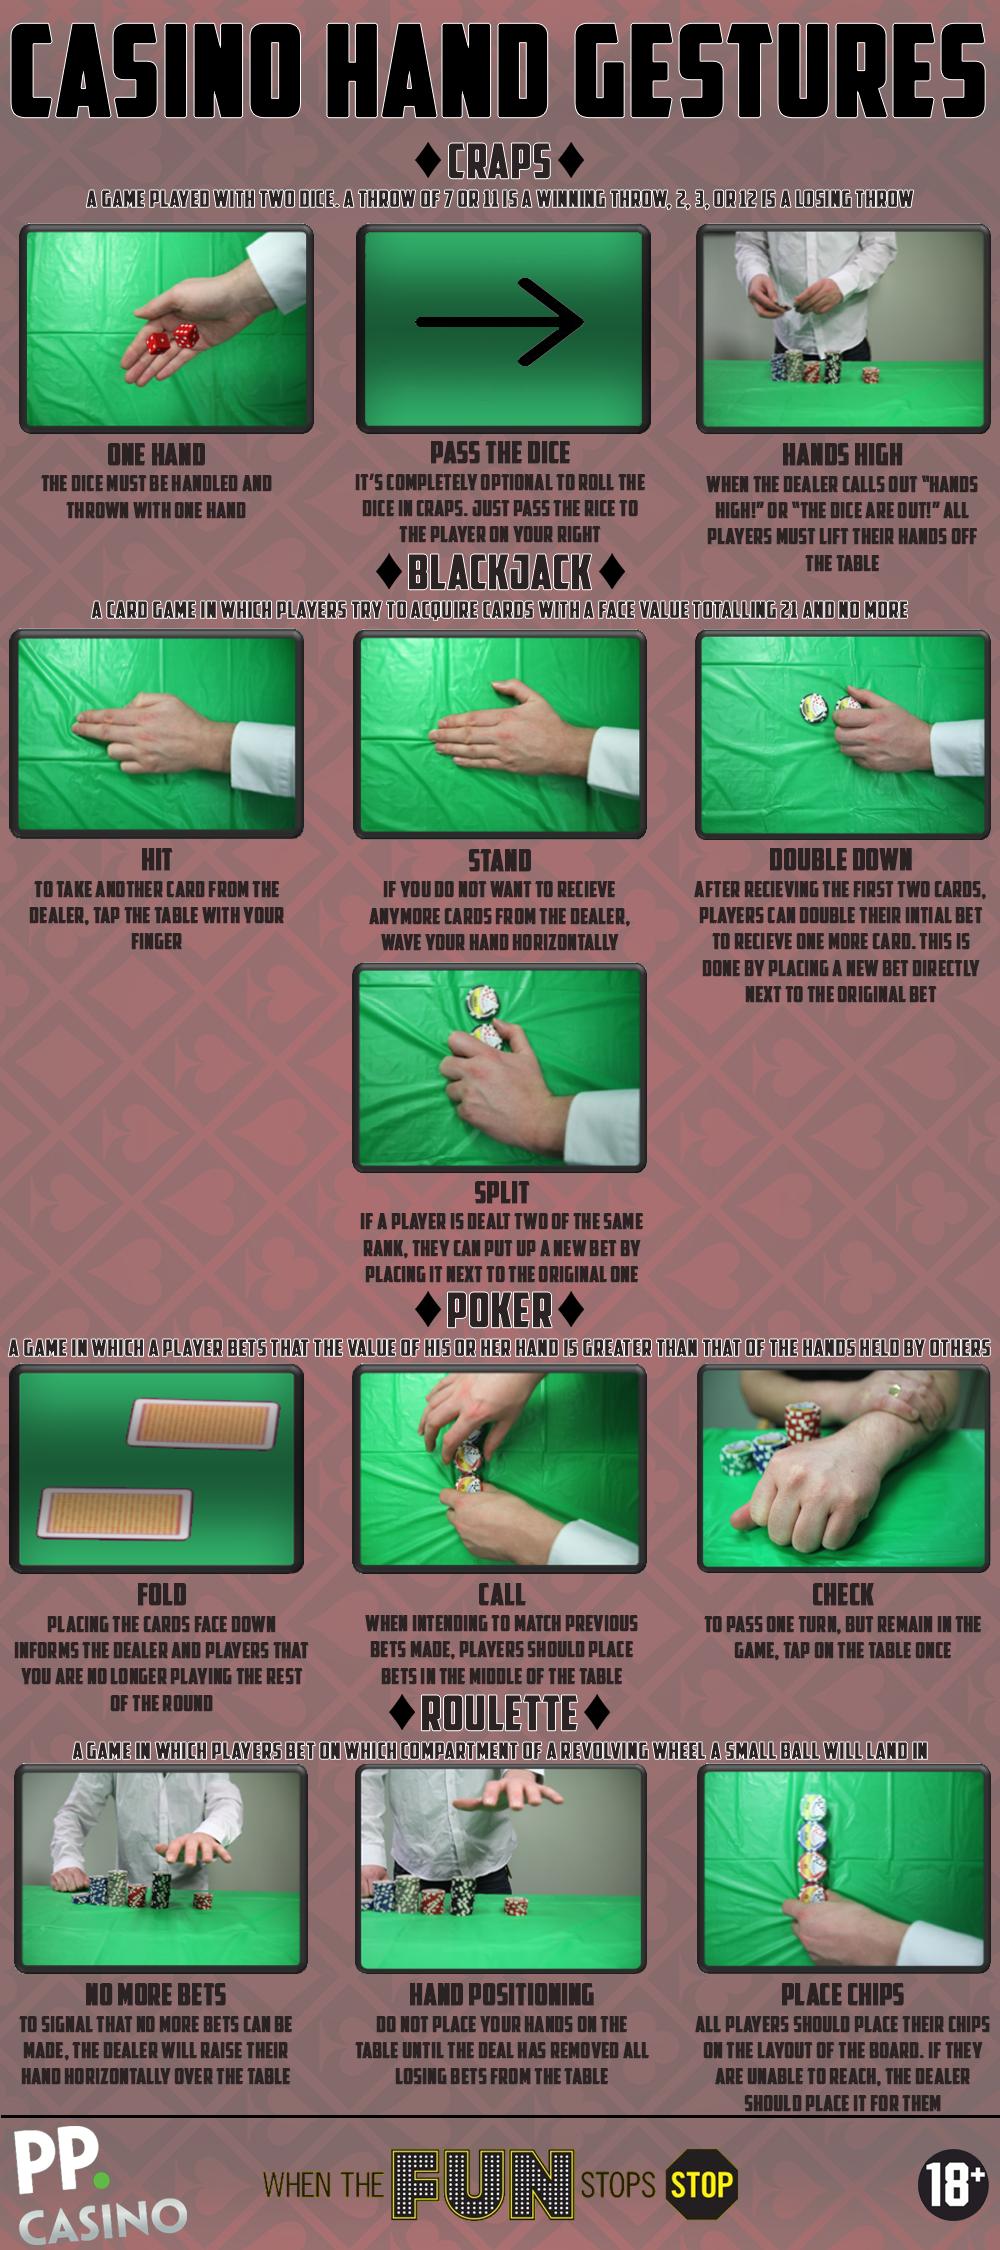 Spielbank hamburg blackjack